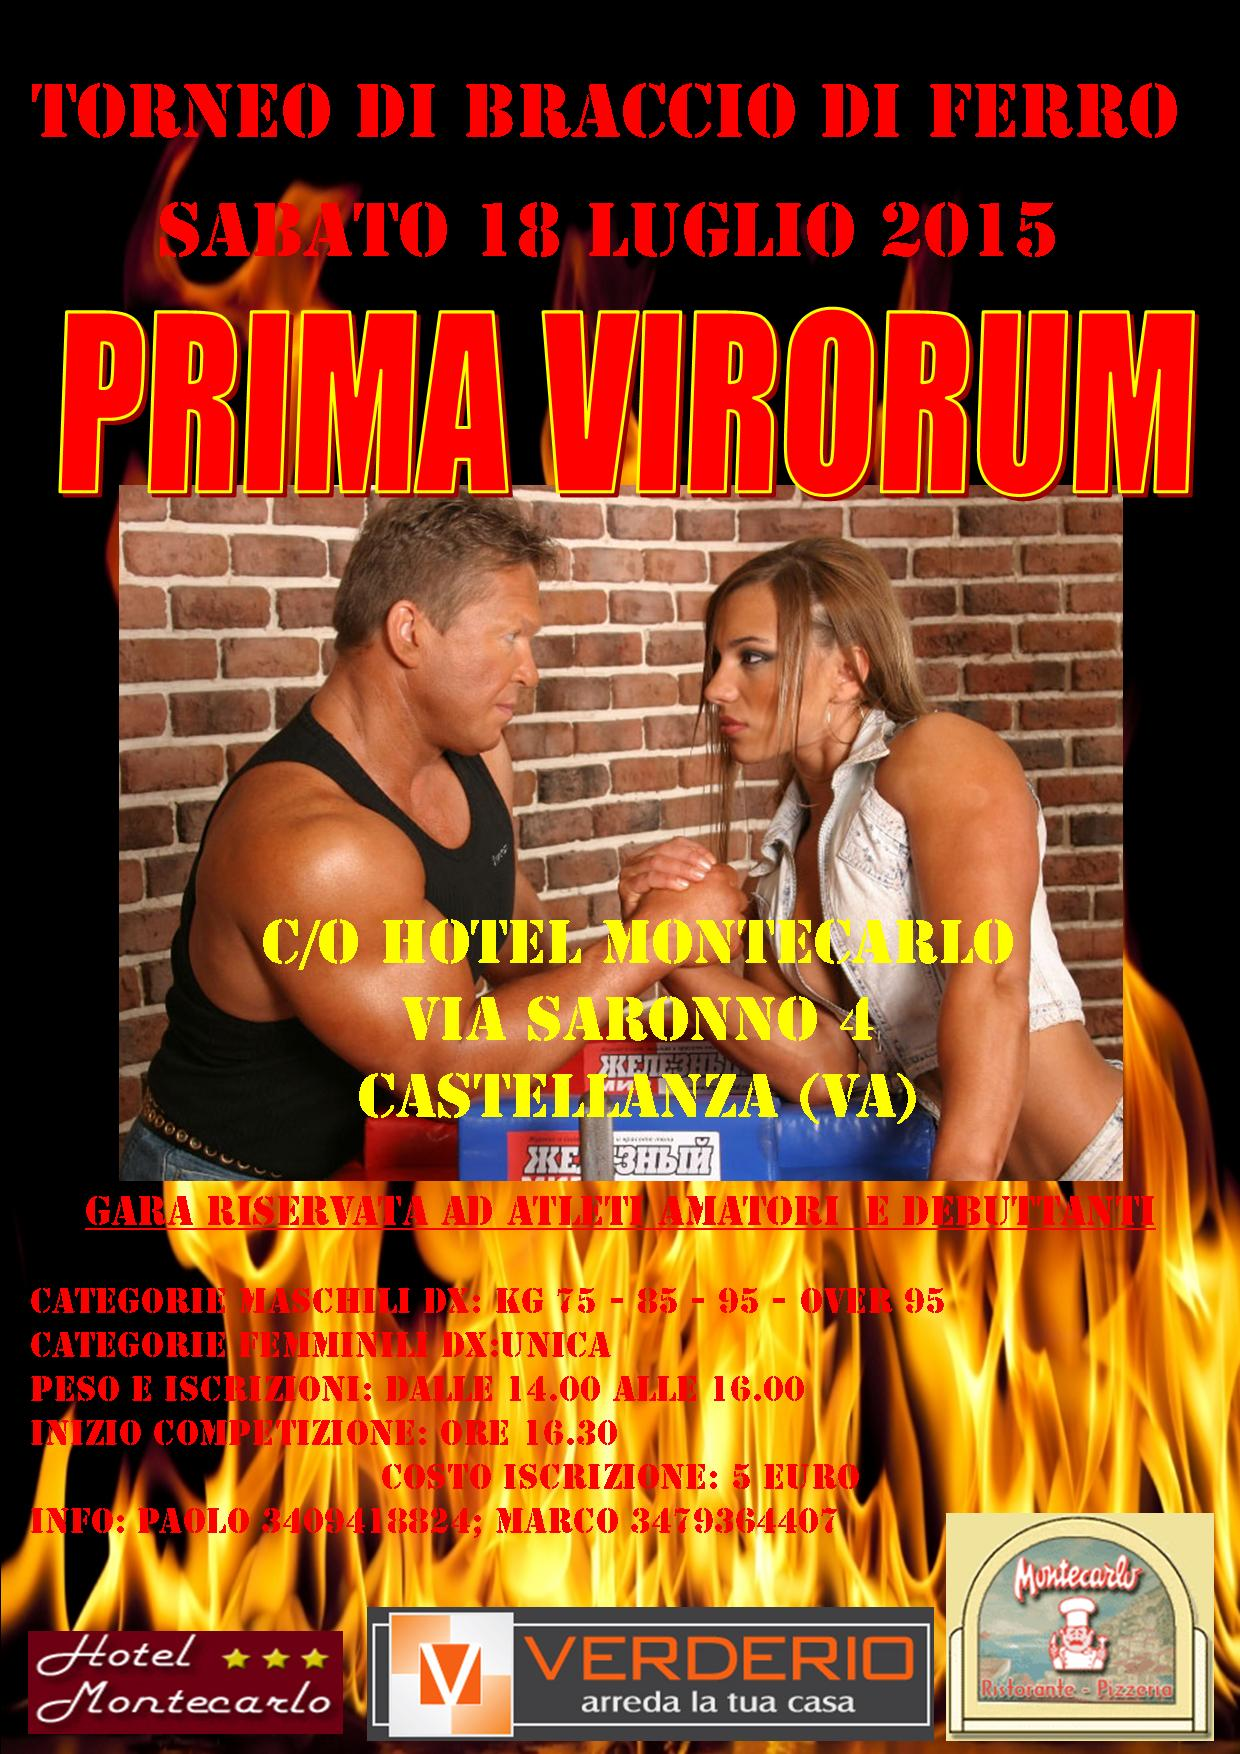 Prima Virorum 2015